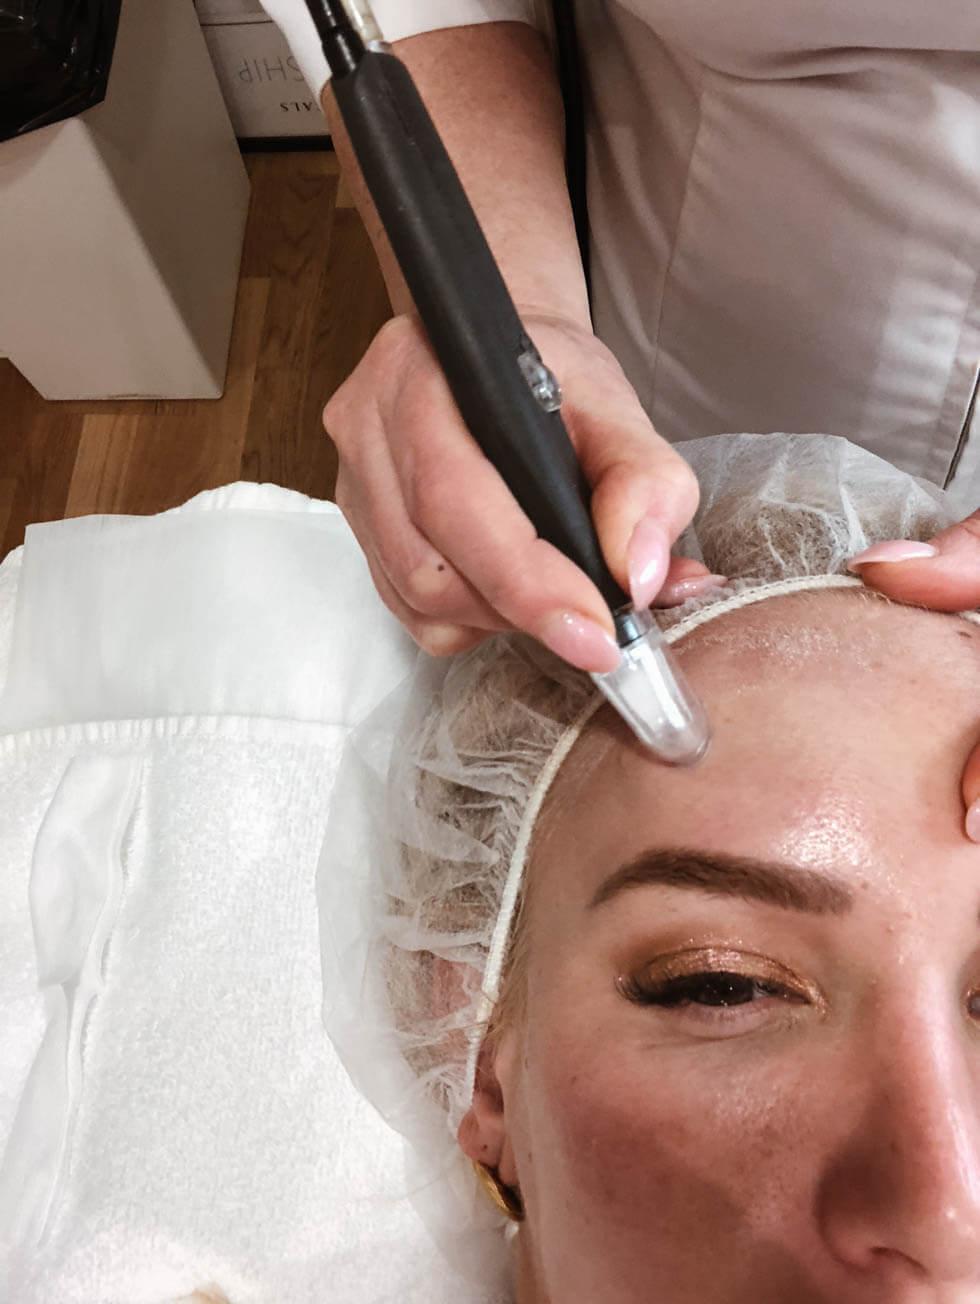 Microdermabrasion- Finslipa huden, damsug och bli kvitt grova porer._-5